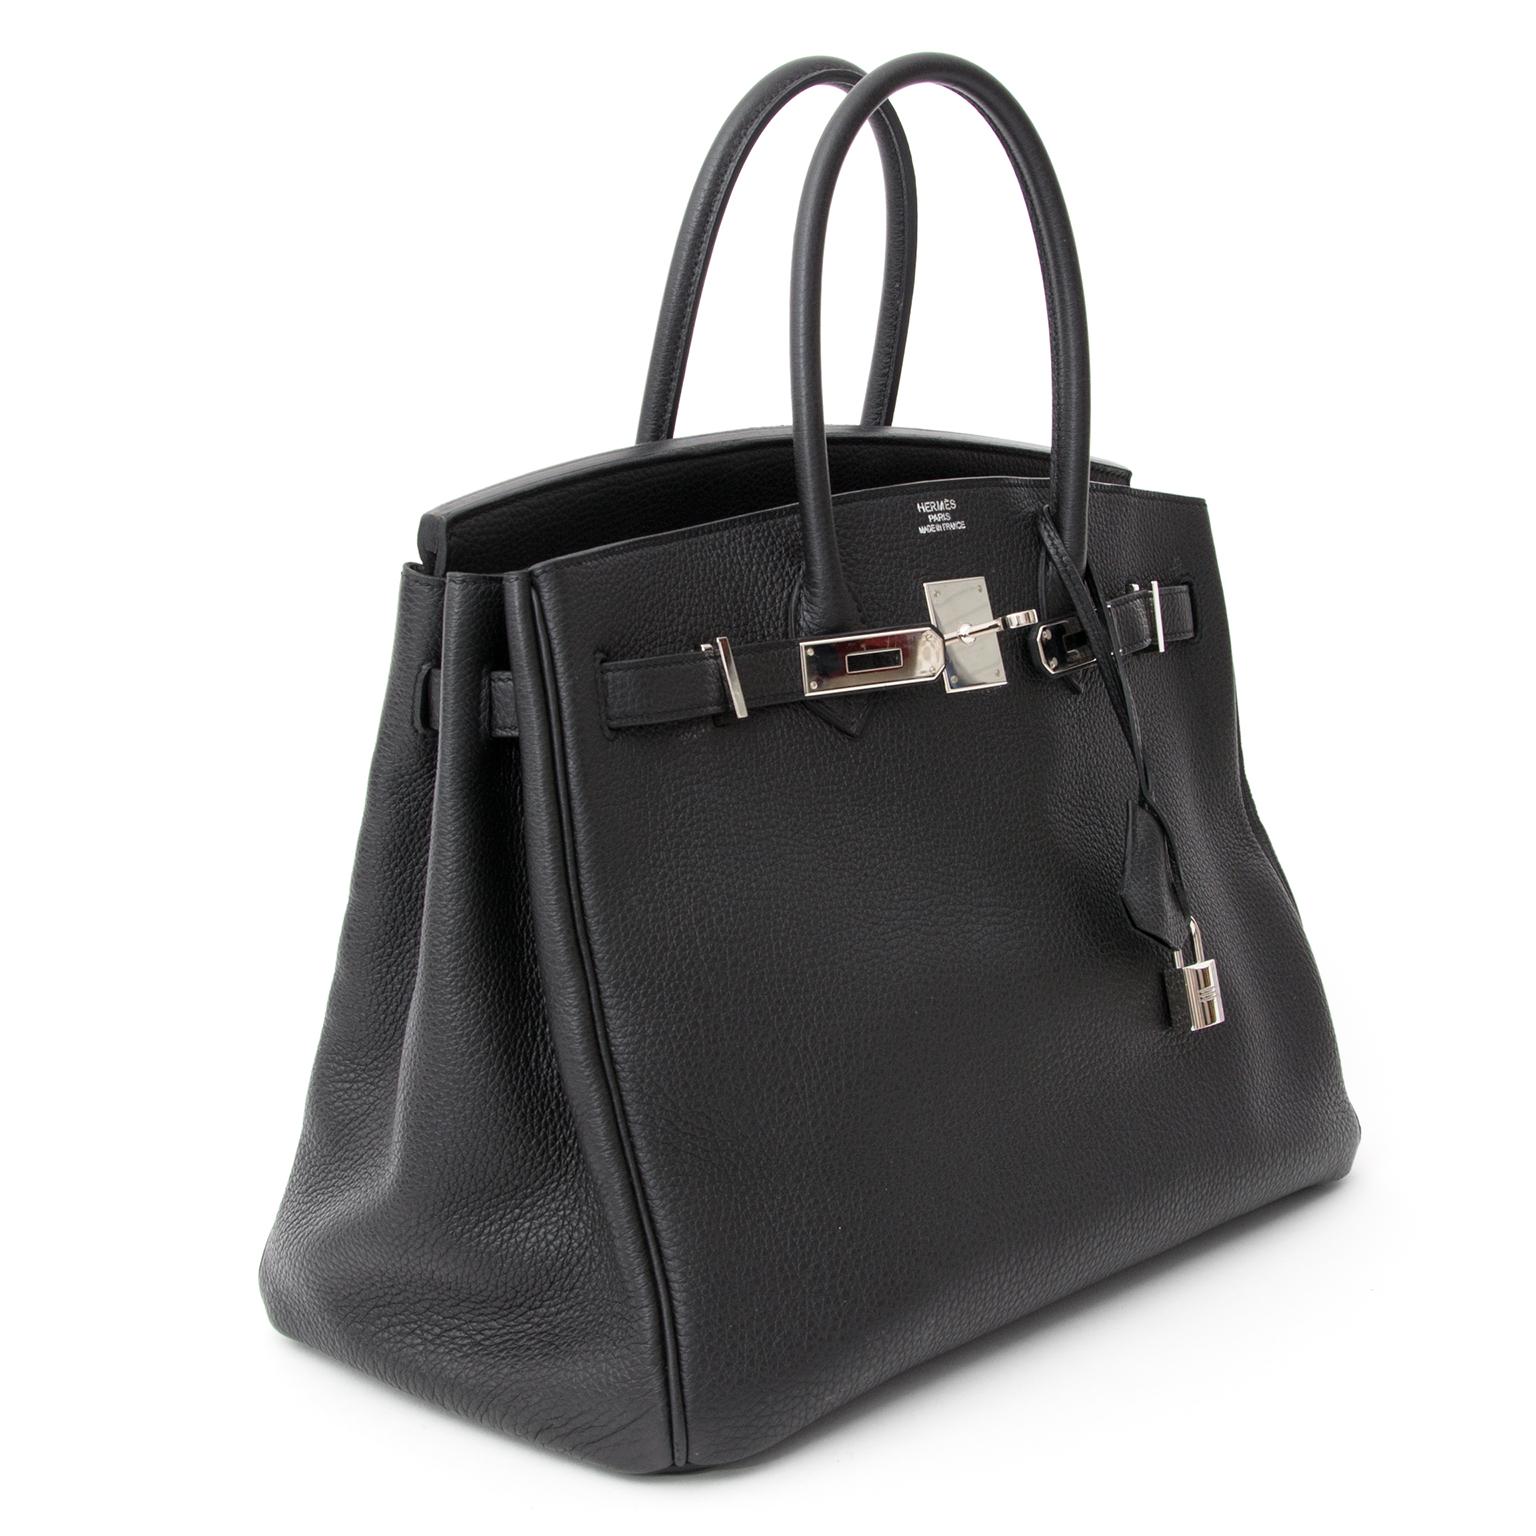 Black hermes birkin bag